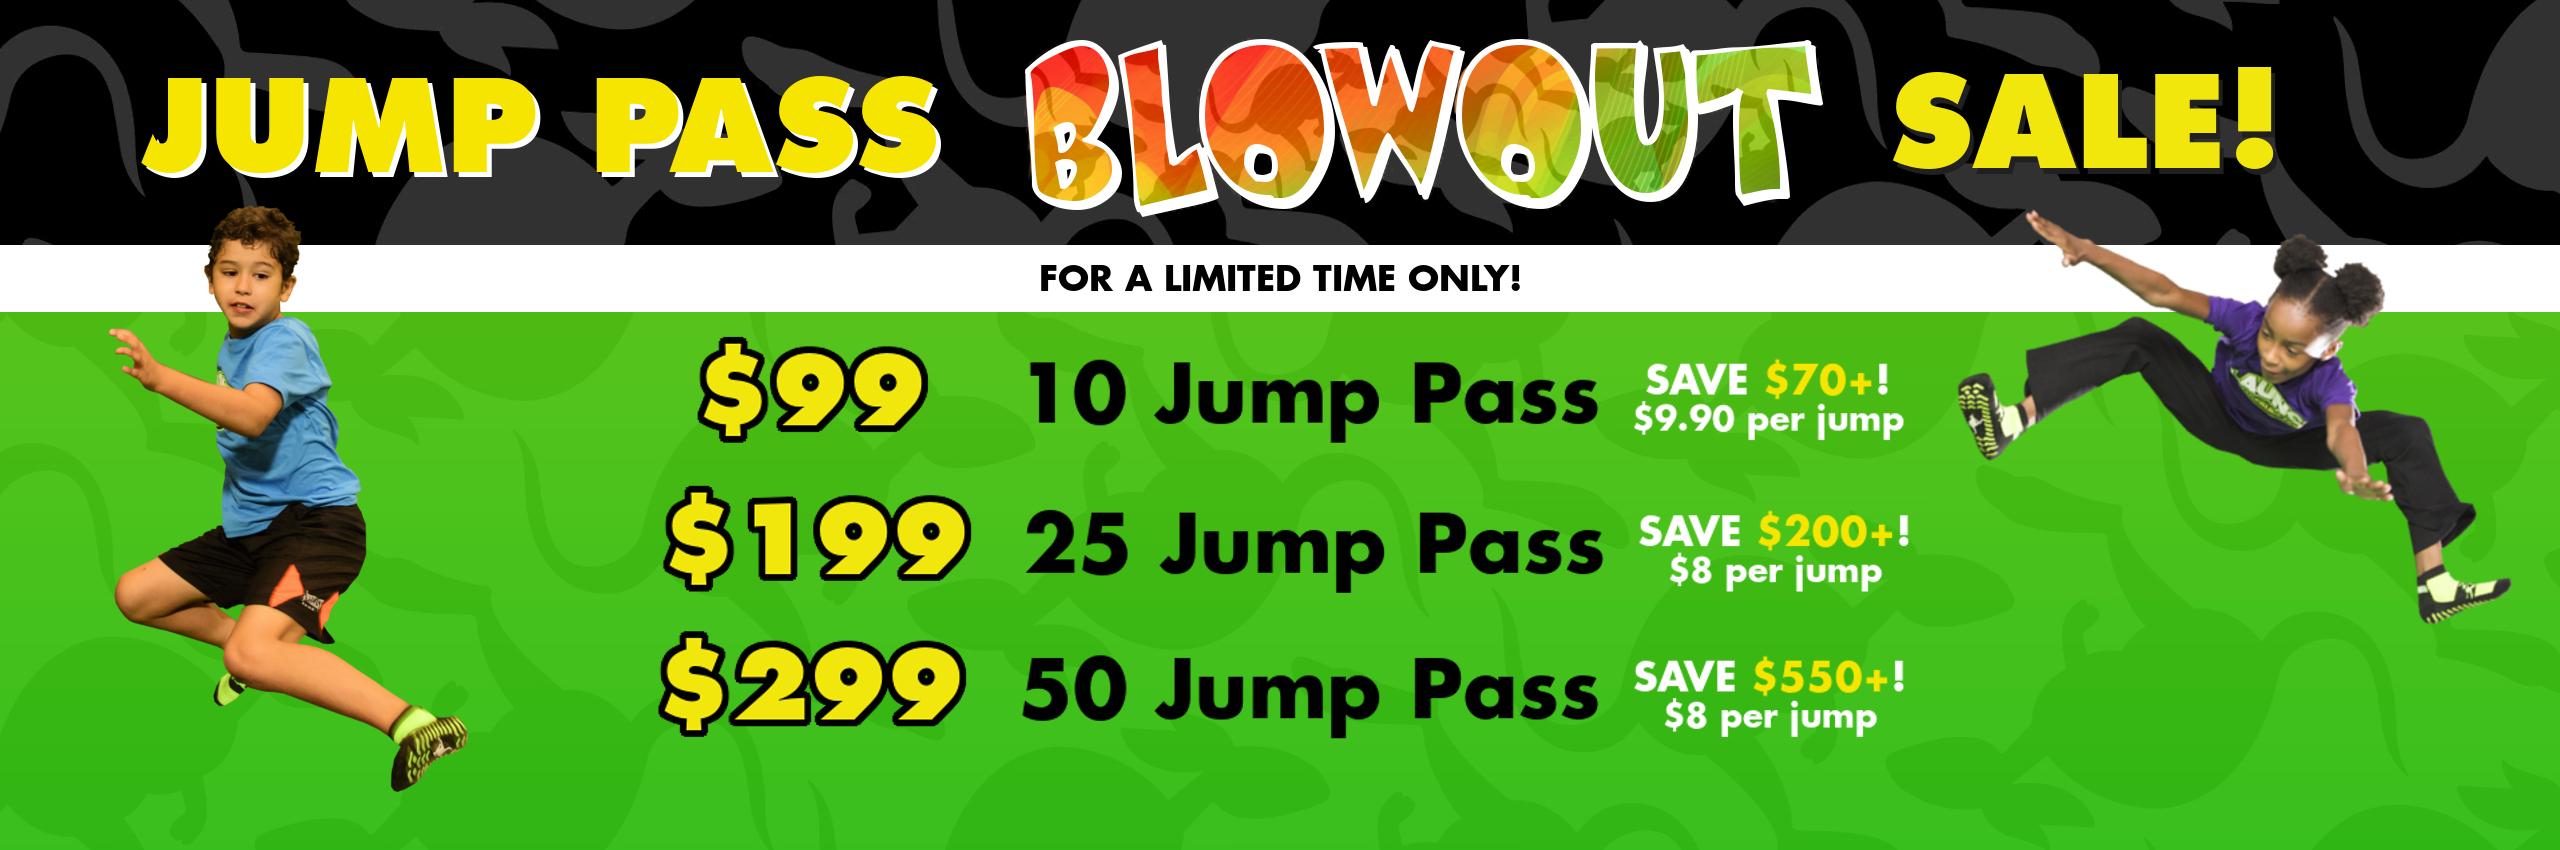 November Jump Pass Blow Out Sale